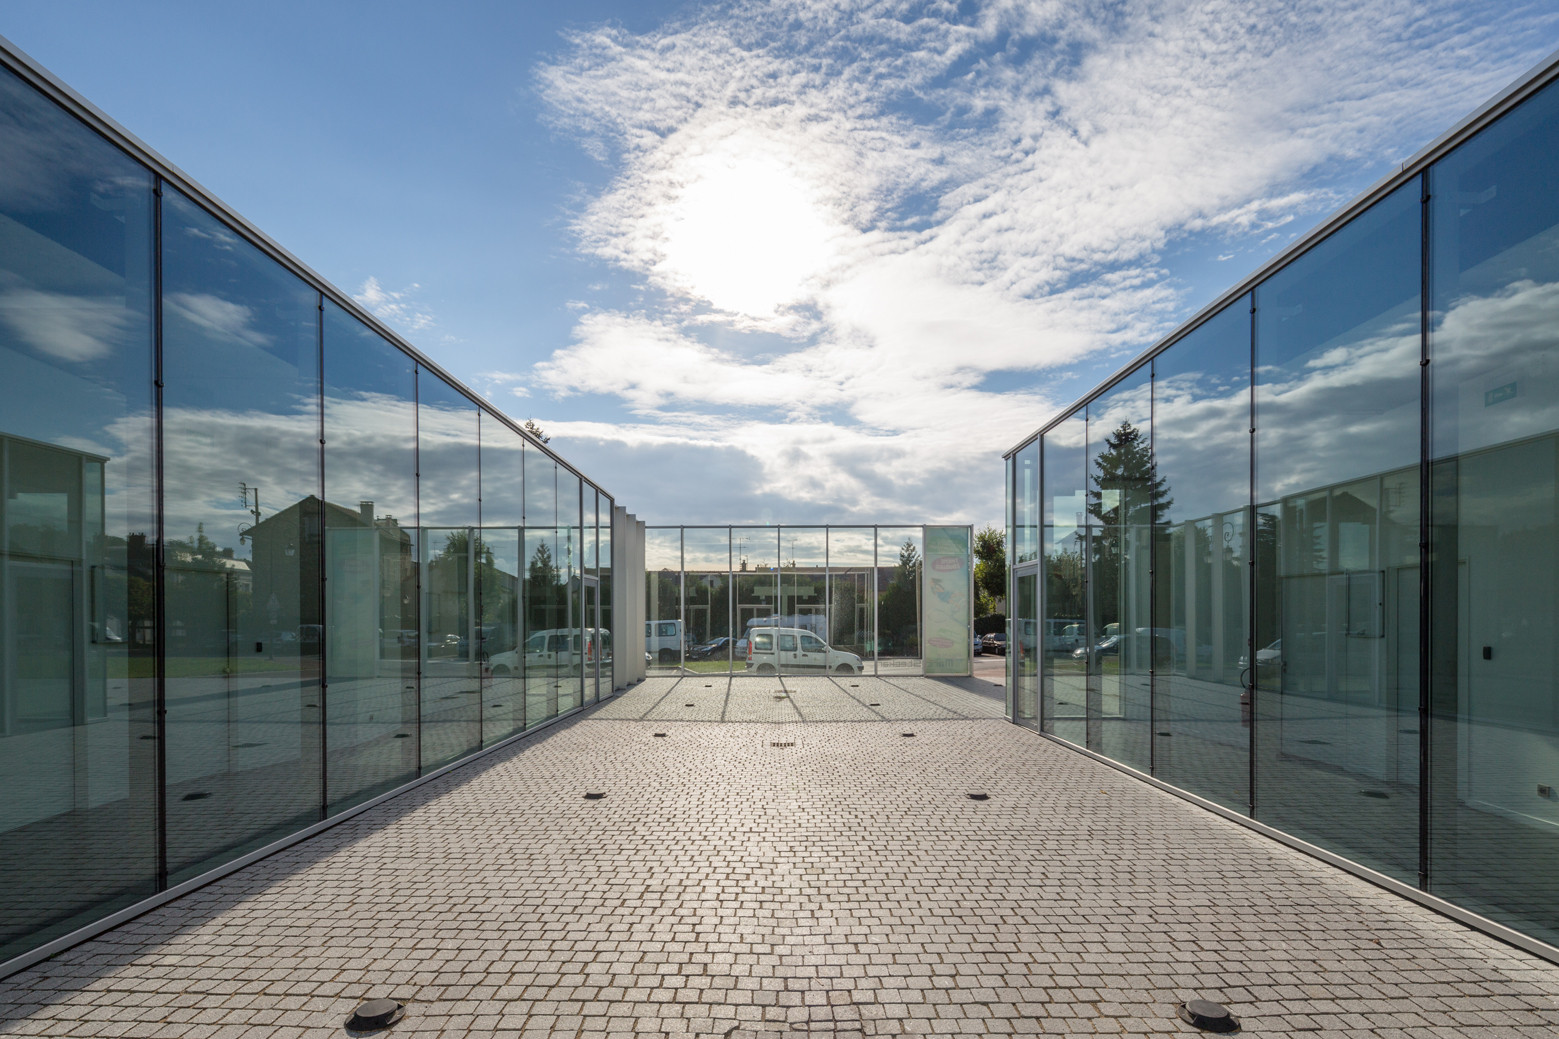 Bessancourt Hall / ARCHICLUB, © 11h45 montrer l'architecture